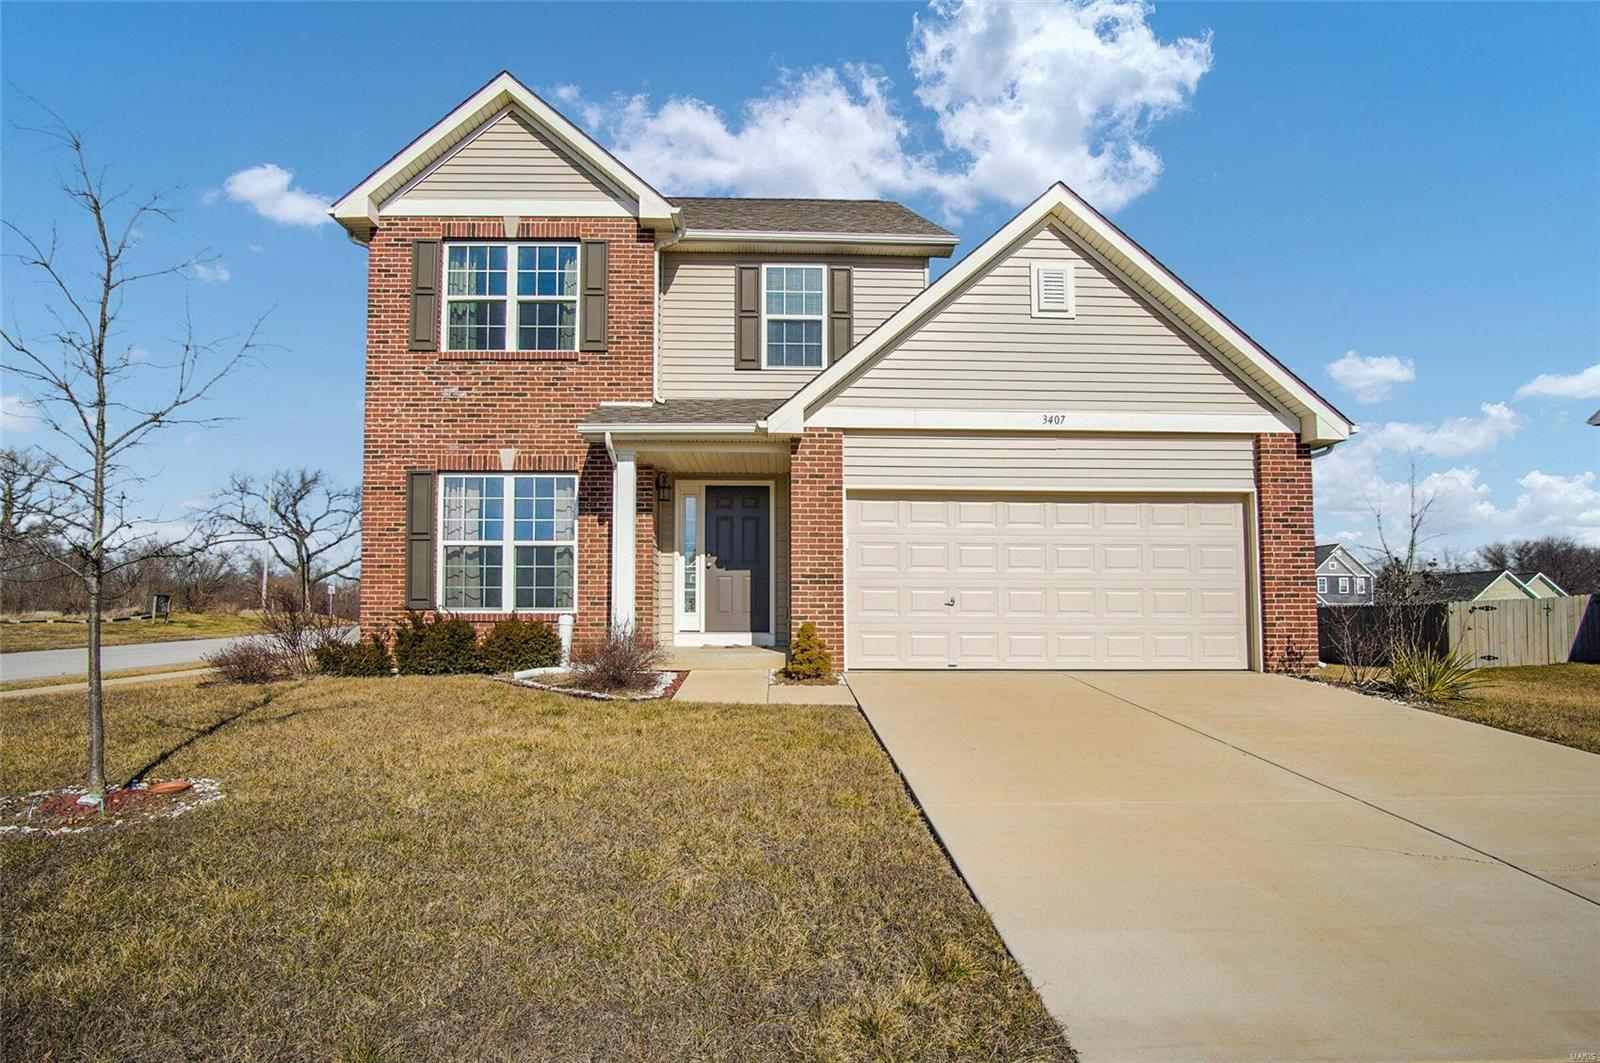 3407 Oak Drive Property Photo - Wood River, IL real estate listing